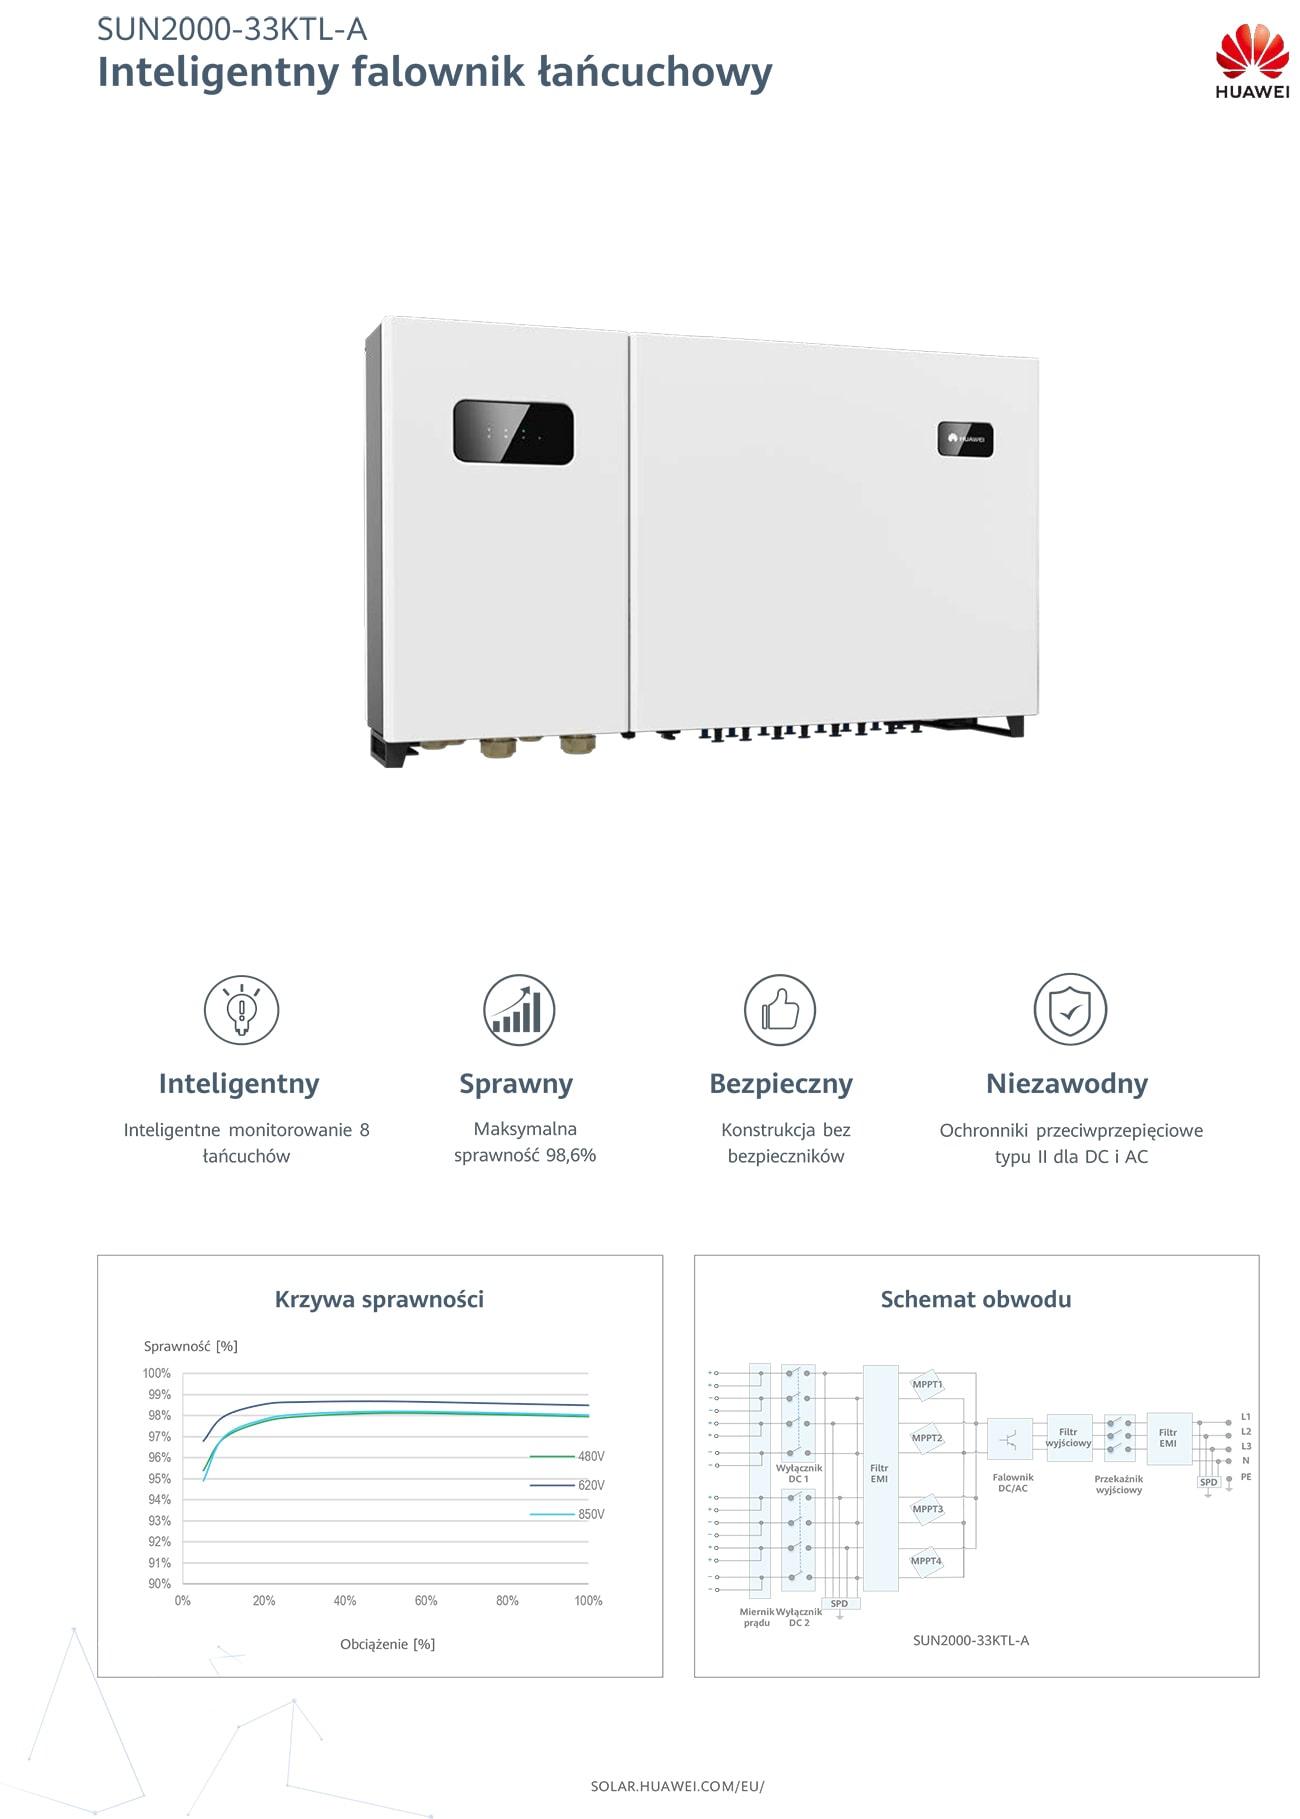 Karta katalogowa inwerter sieciowy Huawei Sun 2000-33KTL-A 3-fazowy